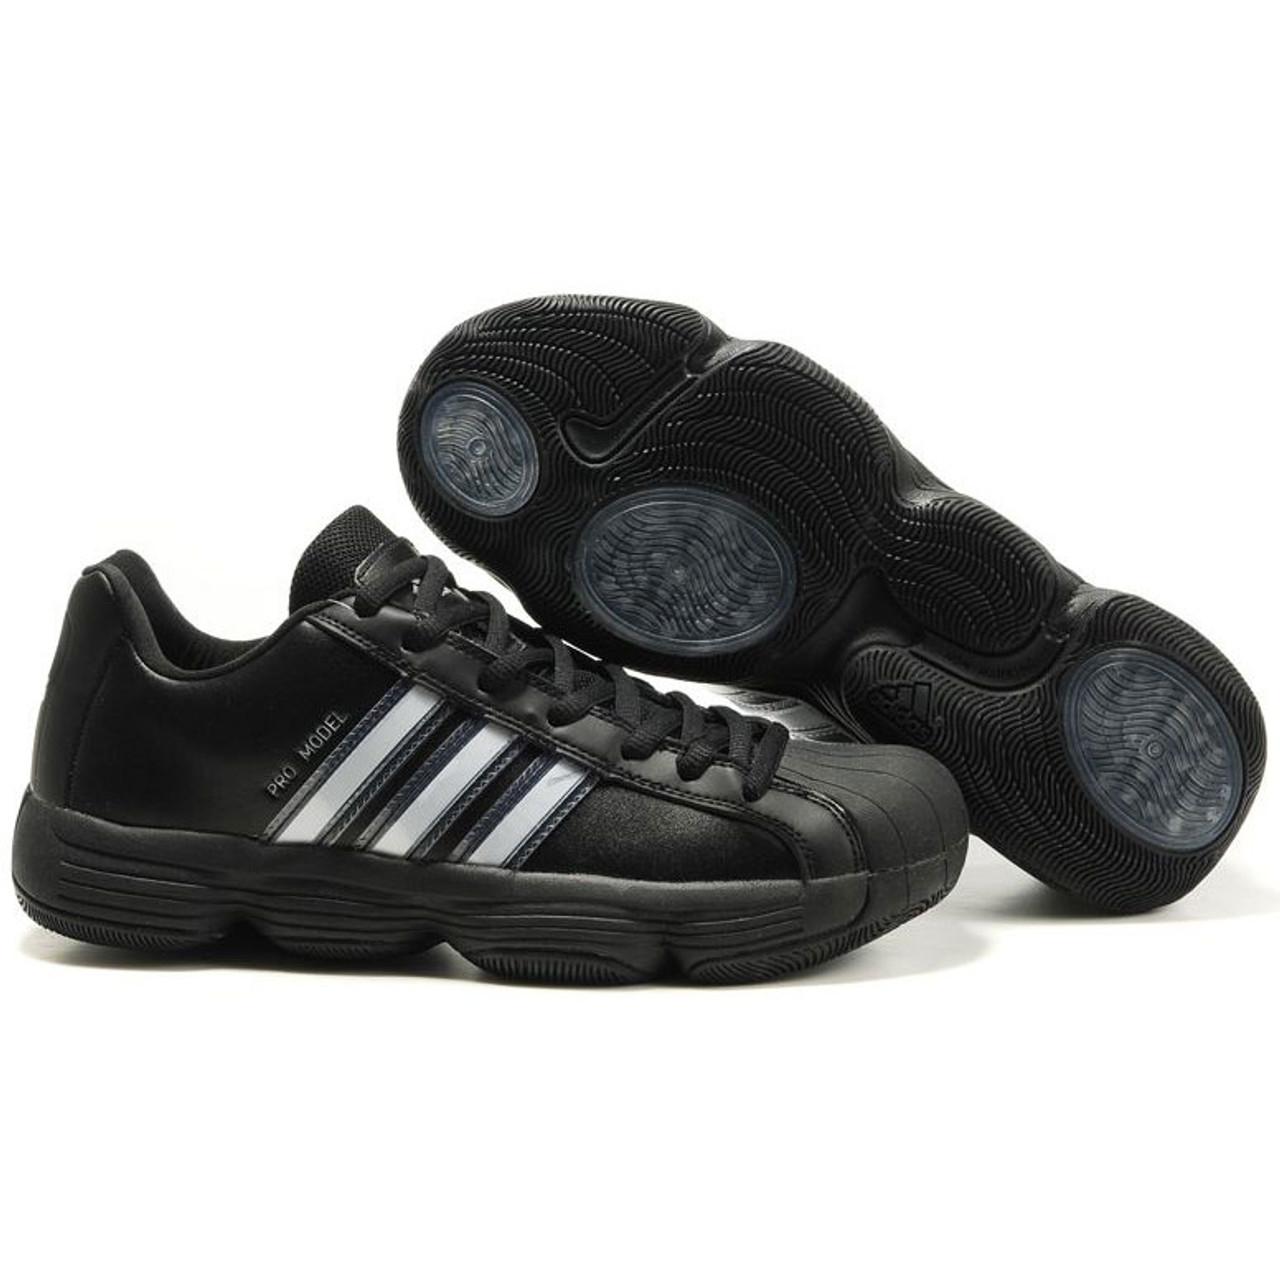 Adidas Pro Model 06 Mens Team Basketball Shoe Black